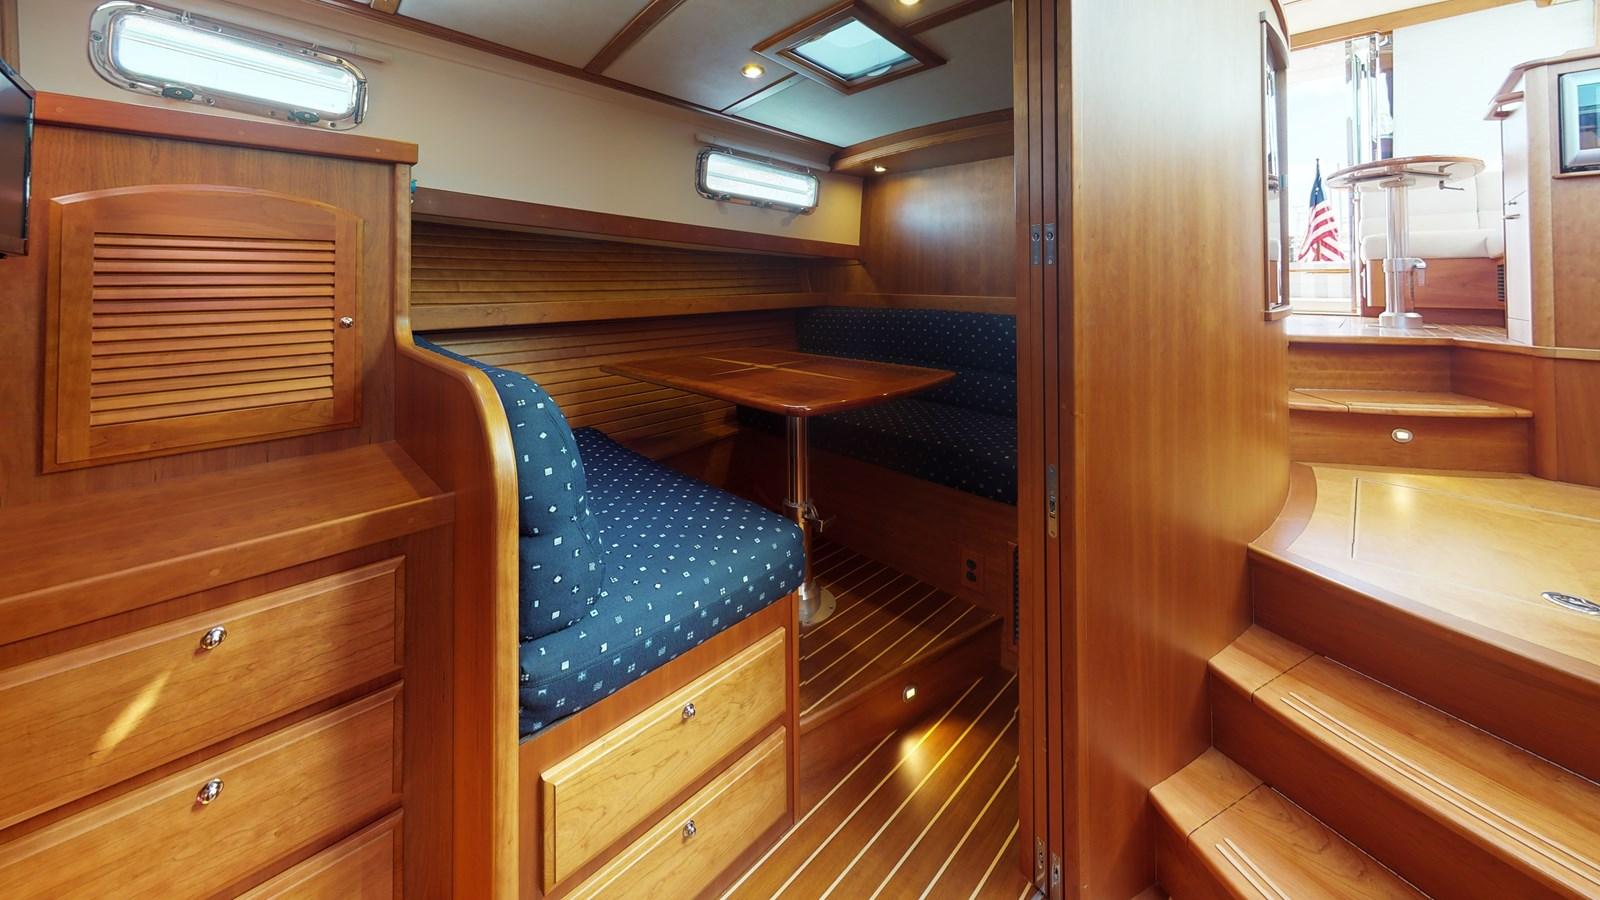 2016 42 Sabre Salon Express - 42 SABRE YACHTS For Sale